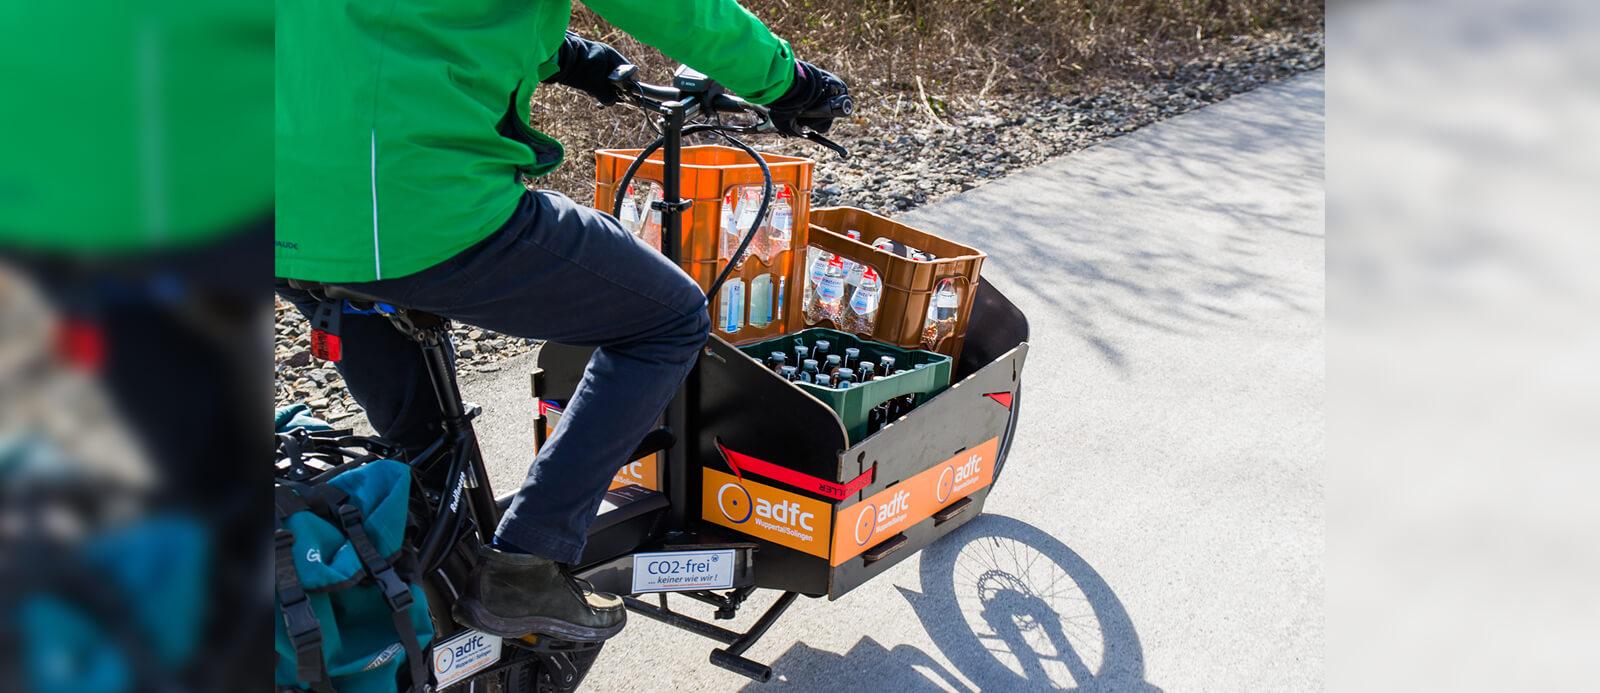 E-Lastenbike mit Getränkekisten.